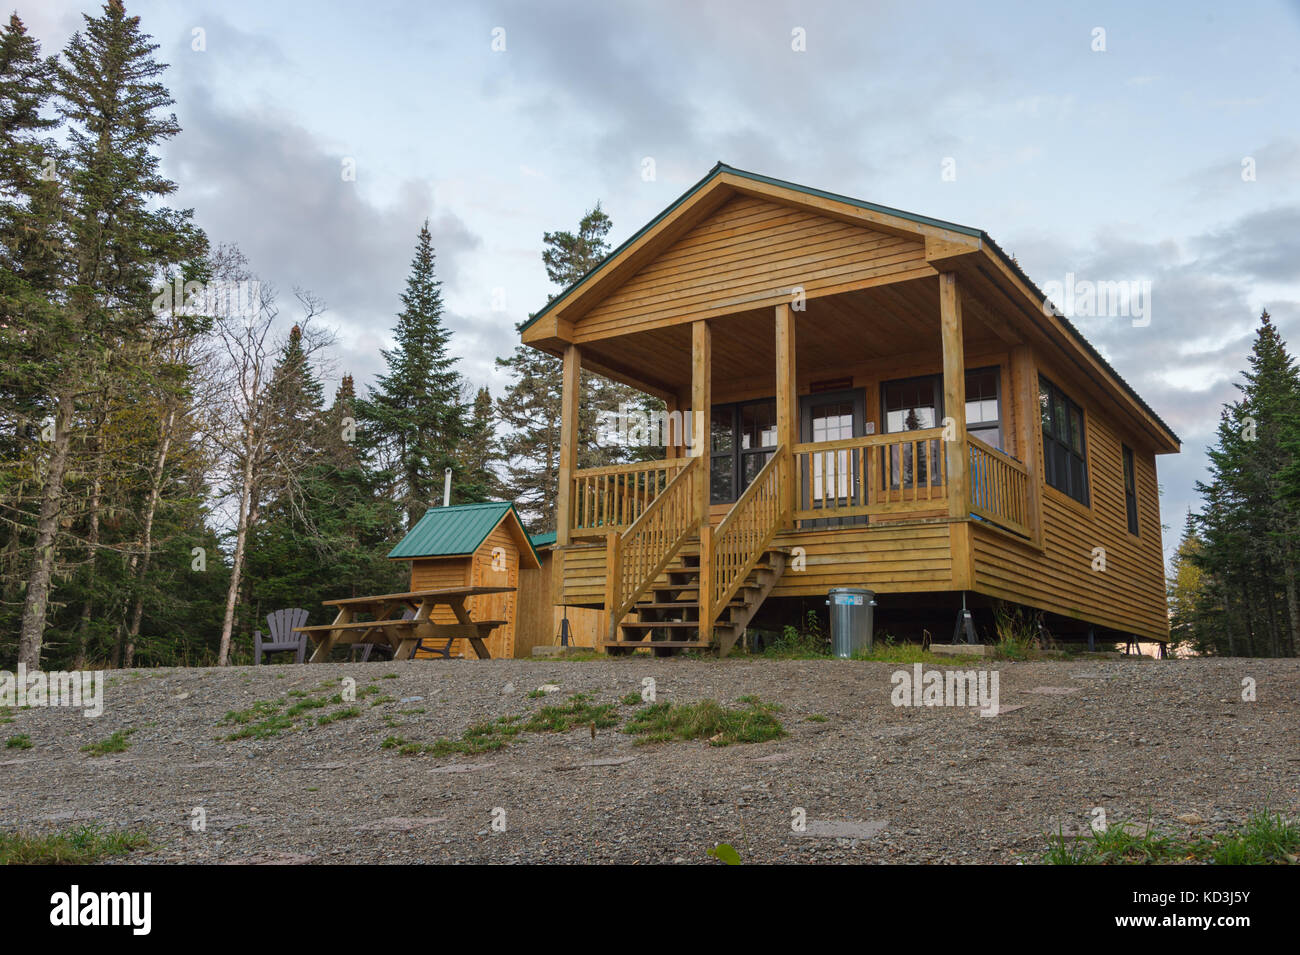 Wooden communal refuge on Megantic Mount National Park, in the Eastern Townshops, Quebec Province, Canada - Stock Image